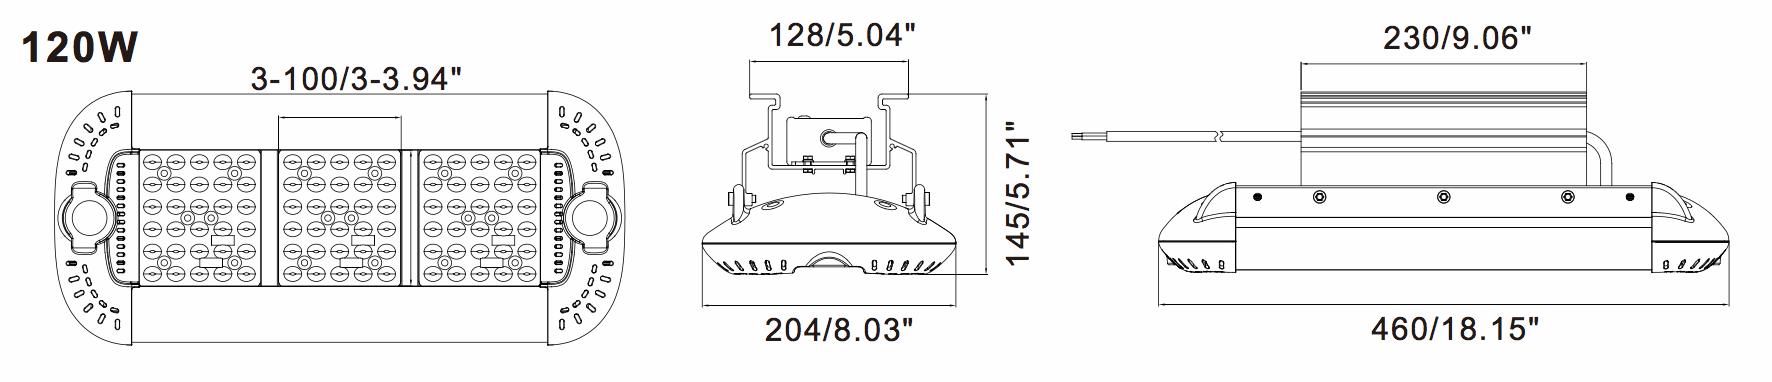 LED Low Bay LBA- 120 Dimensions